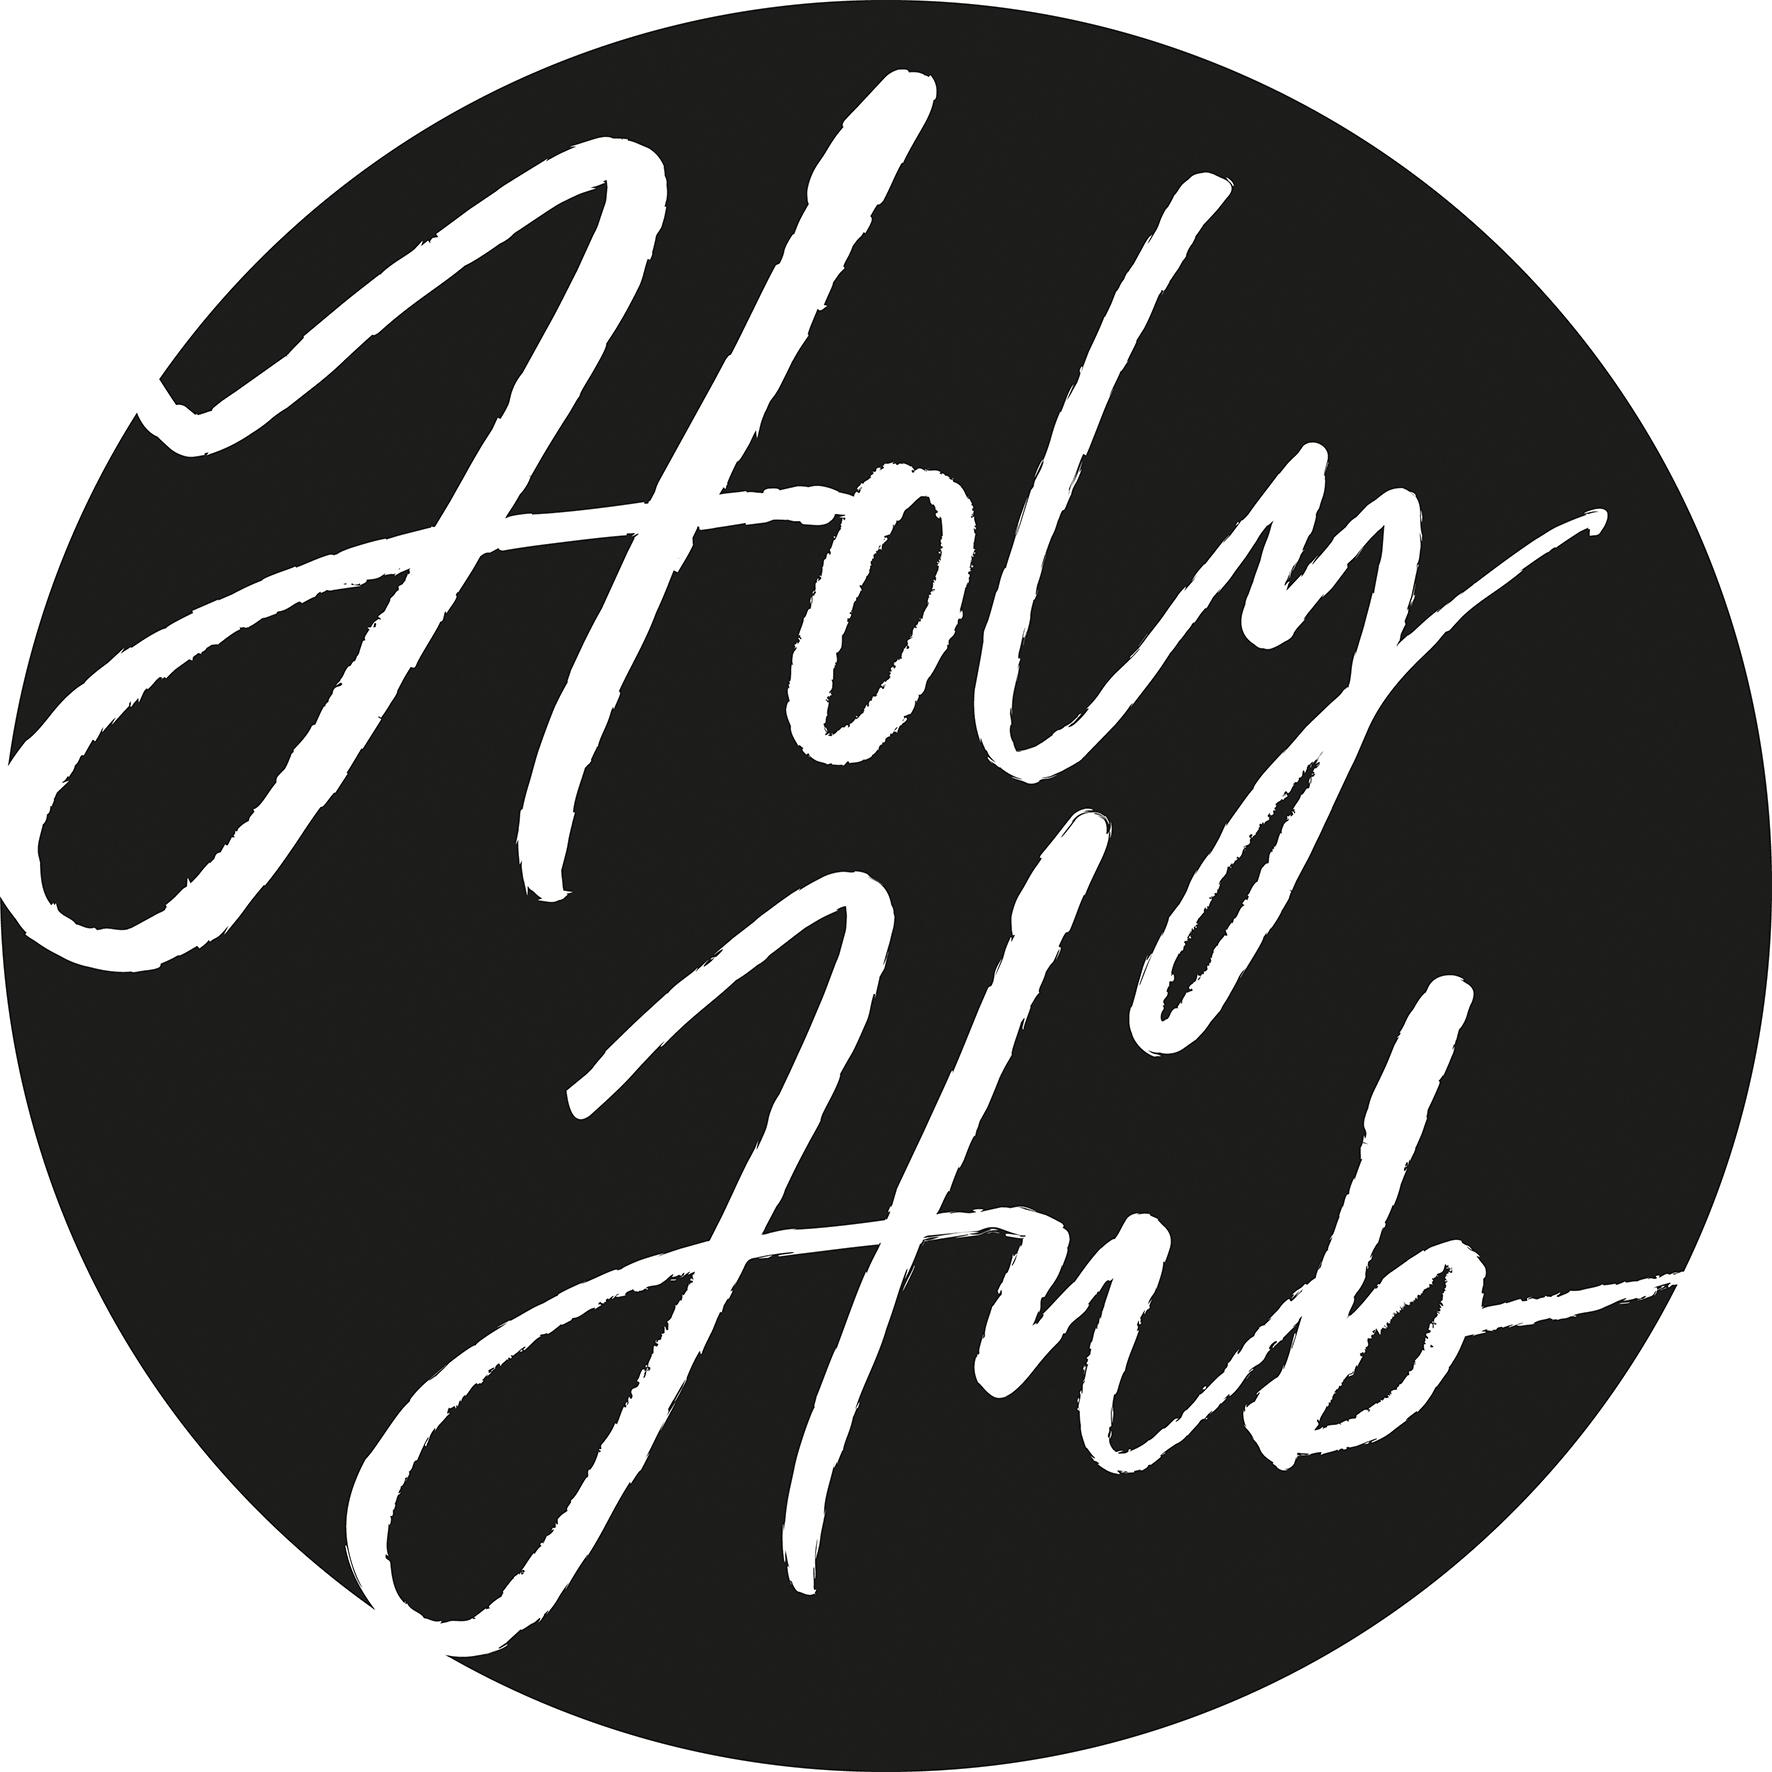 holyhub.nl